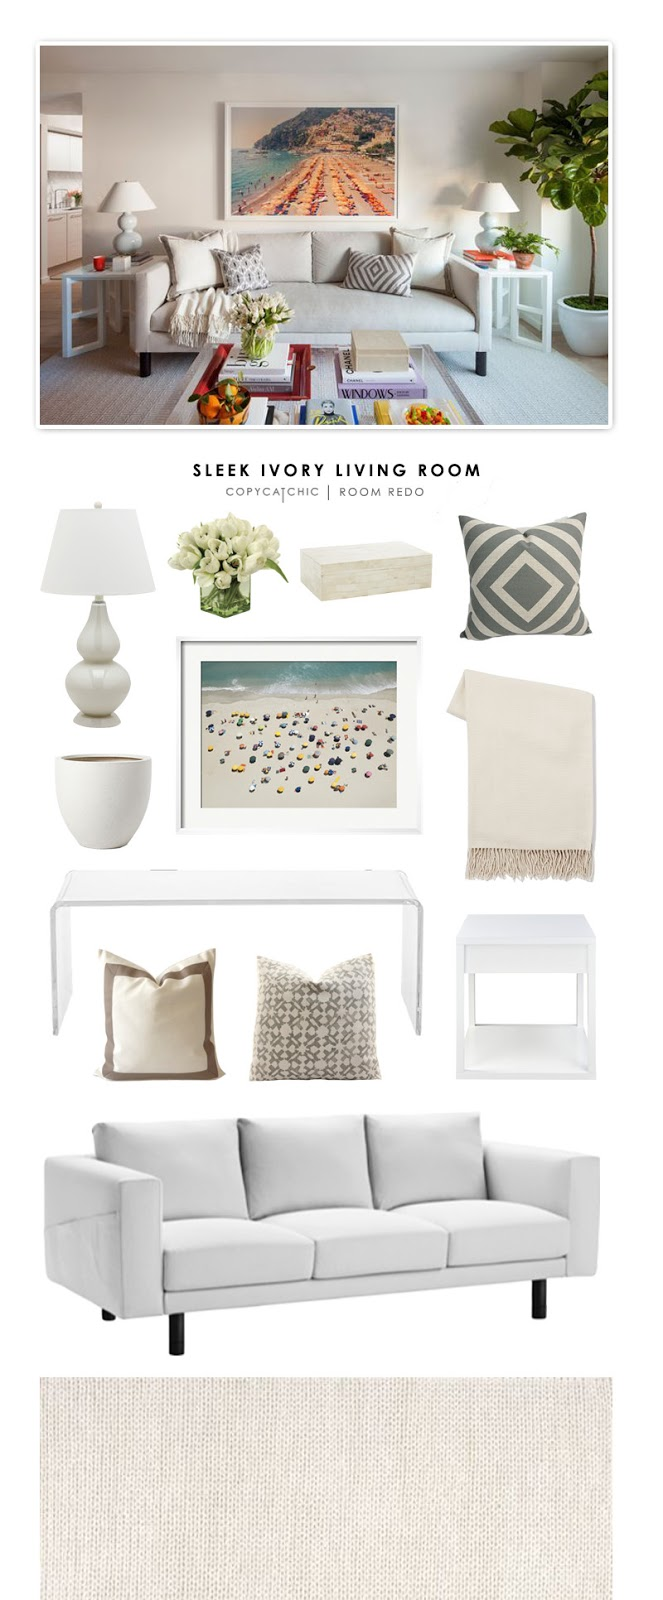 Copy Cat Chic Room Redo | Sleek Ivory Living Room - copycatchic